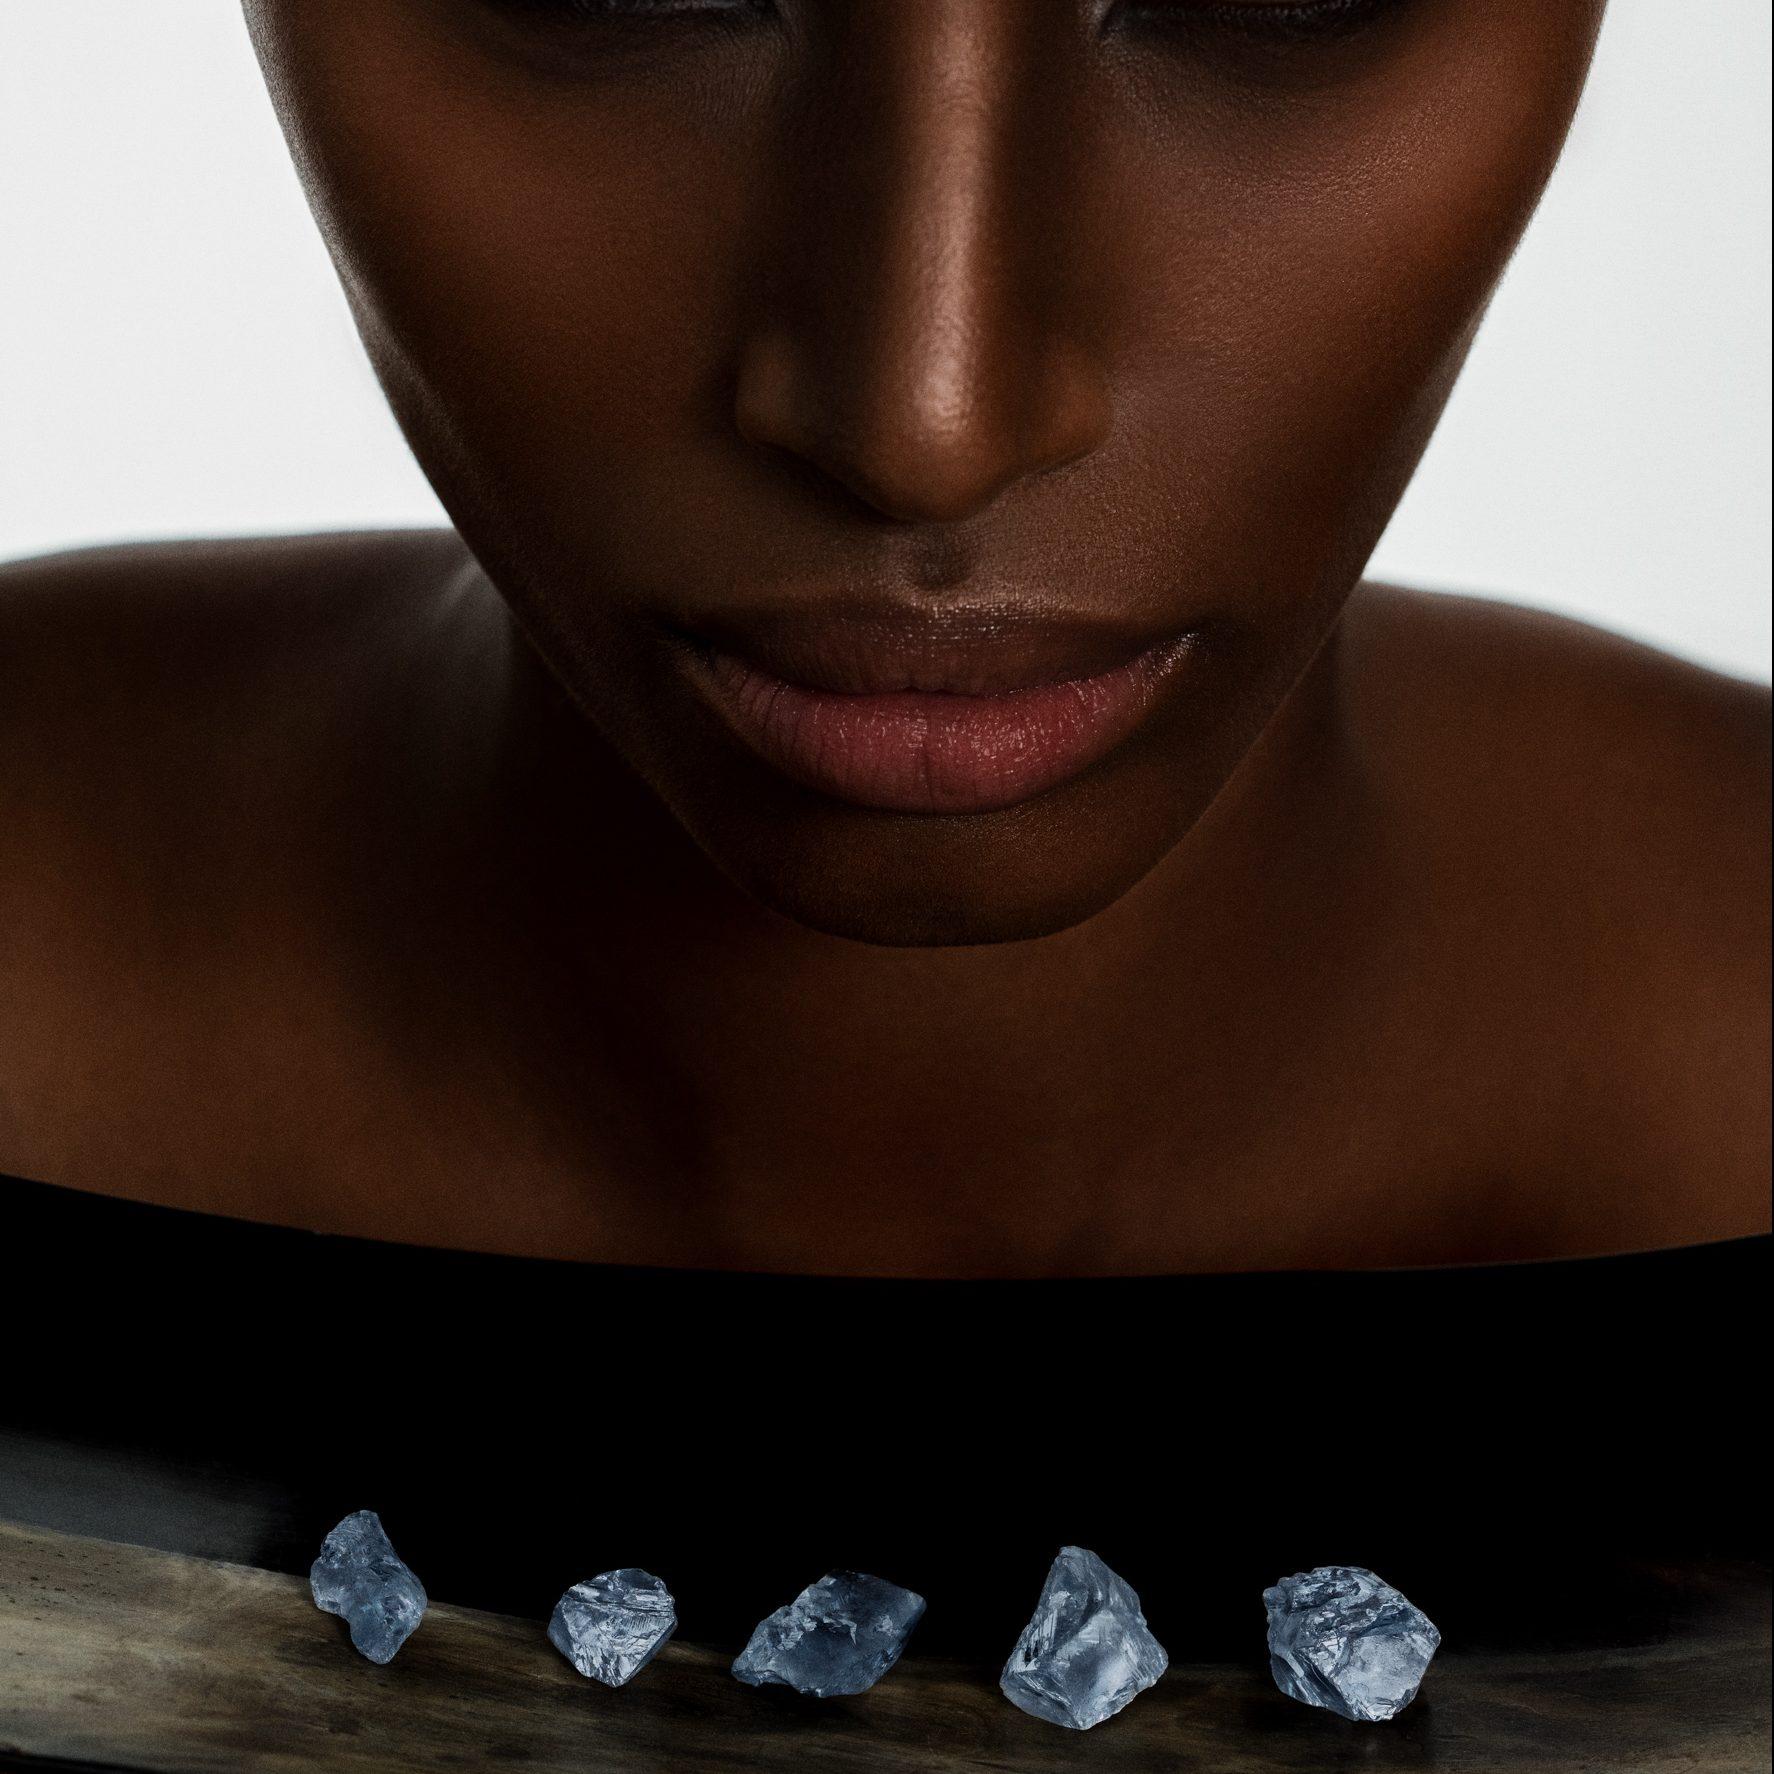 Petra Diamonds Sells Five Blue Rough Diamonds For A Cheap Price, Right!